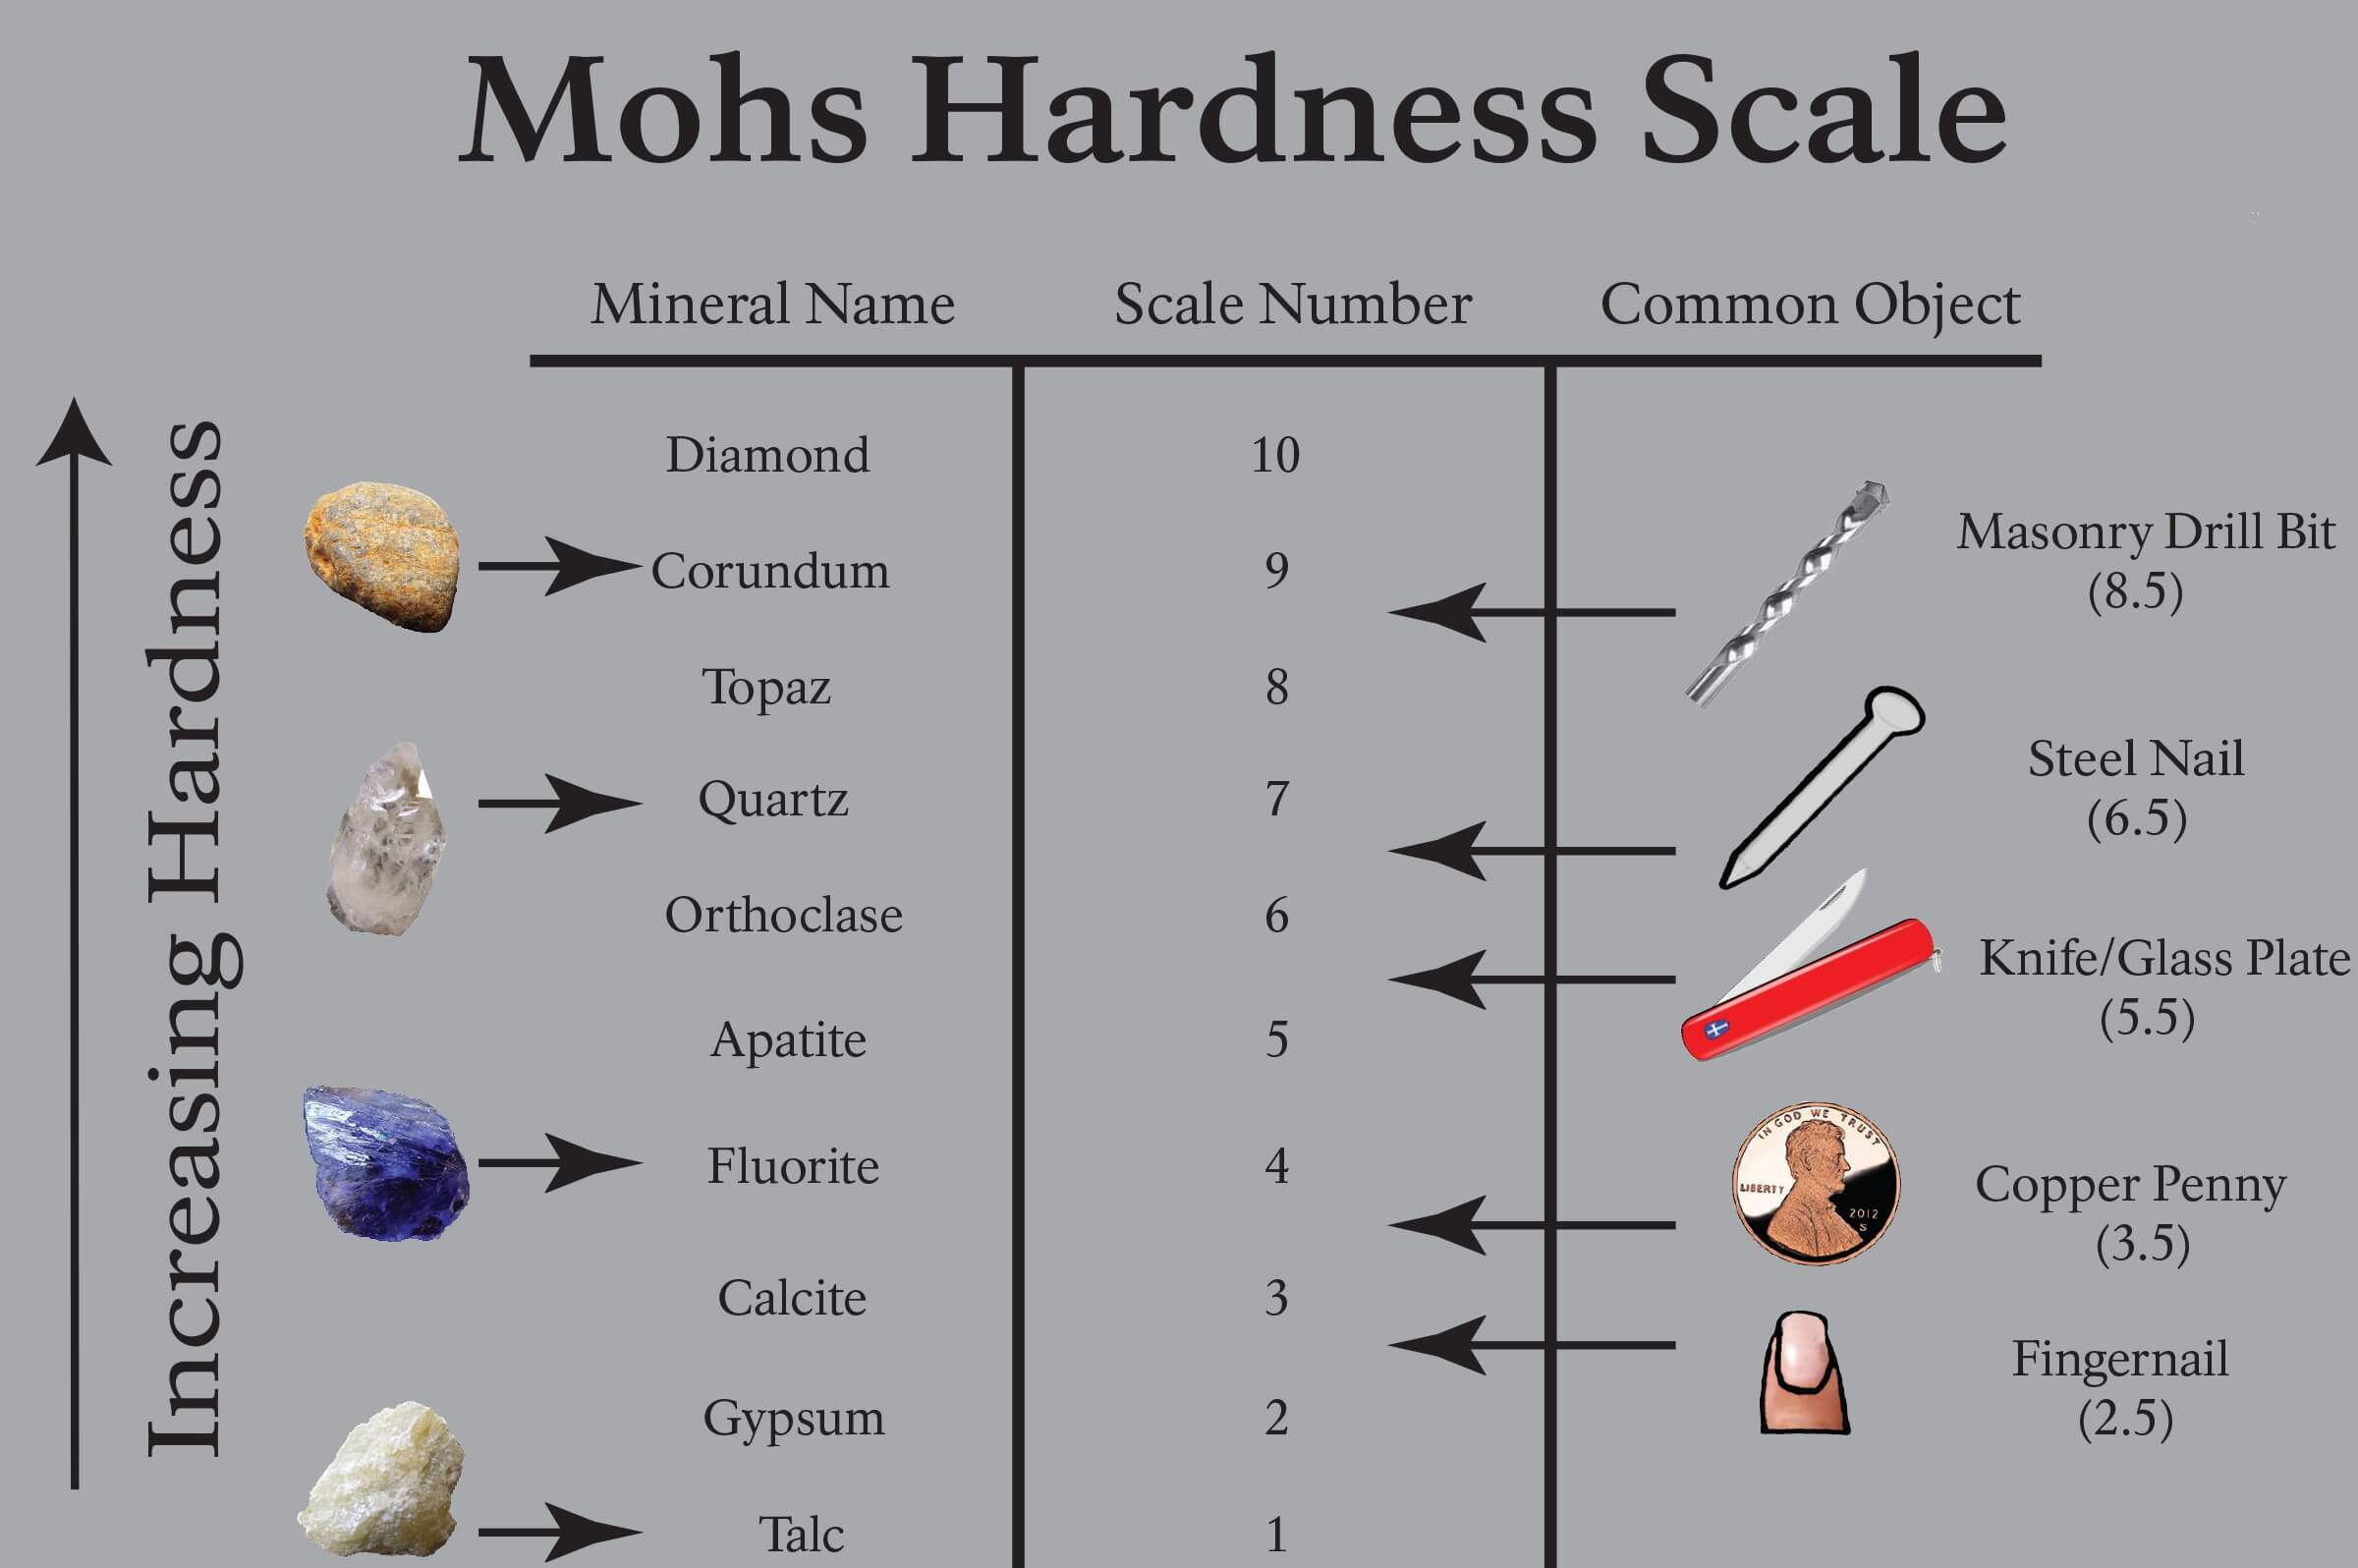 Mohs Hardness Tester